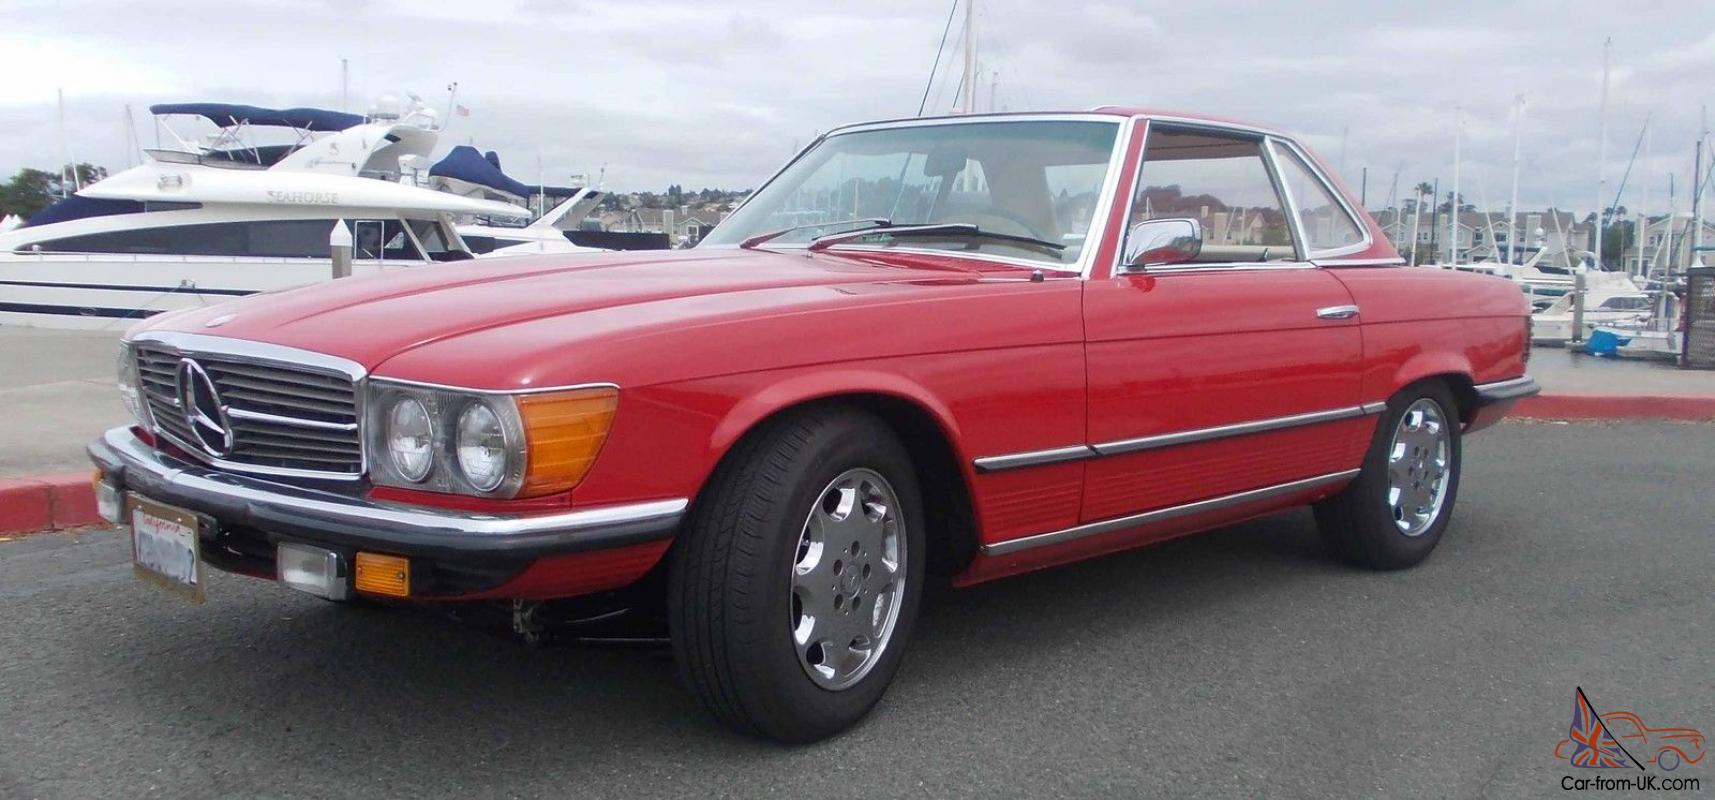 1973 BENZ / VETTE --- 450SL Mercedes with LS1 Corvette Engine